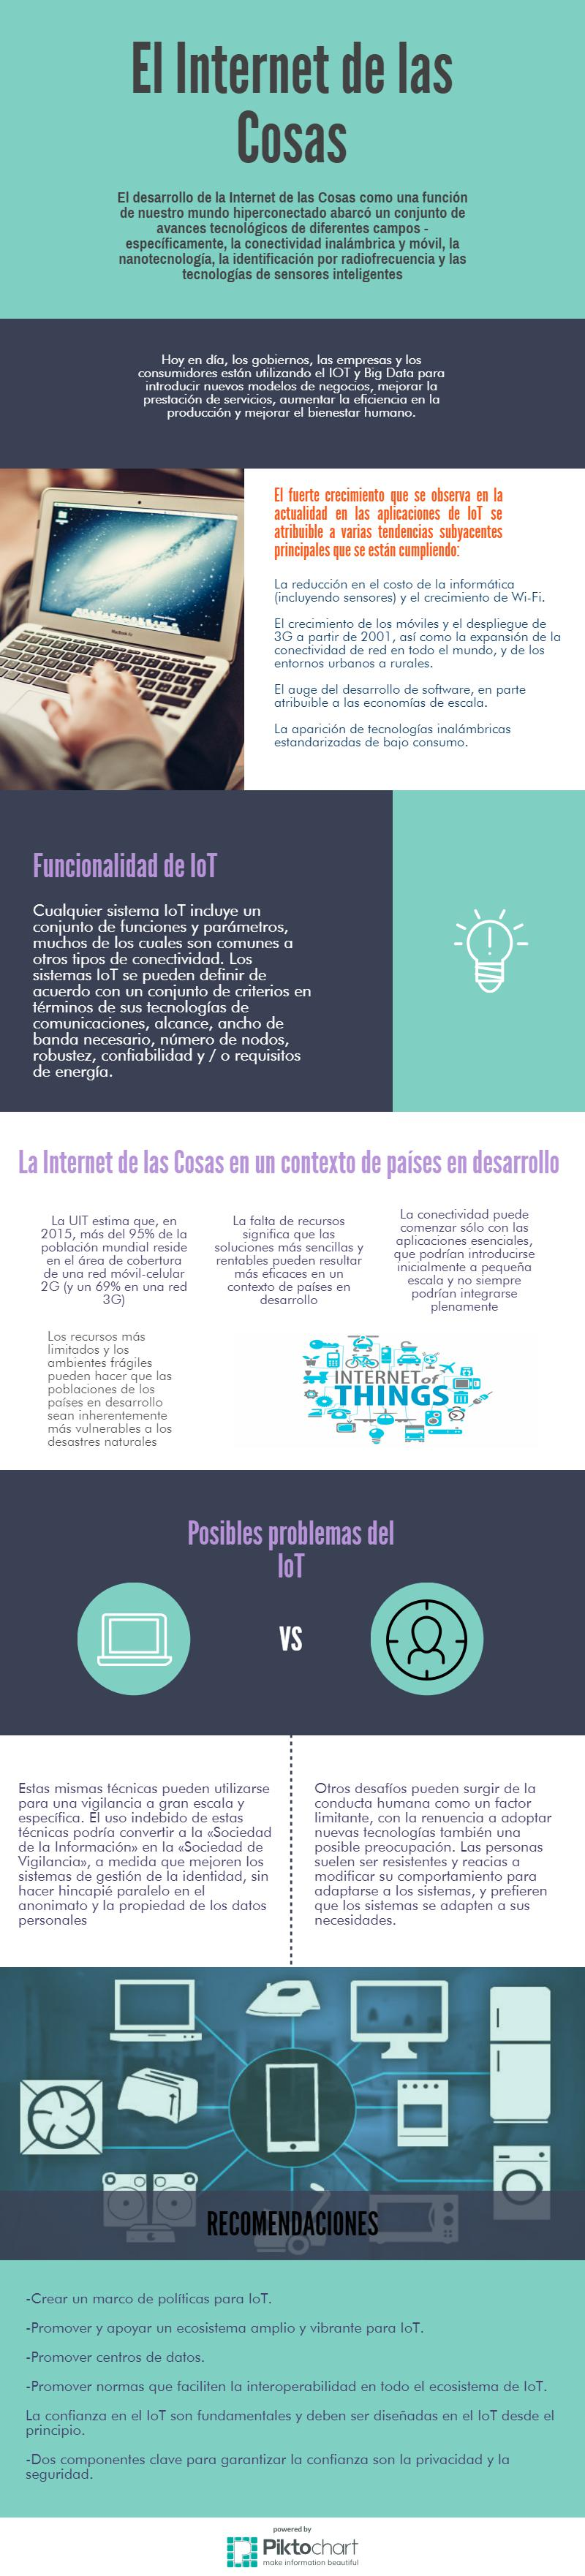 Infografìa IoT . Actividad 10 - Pablo Teran.jpeg